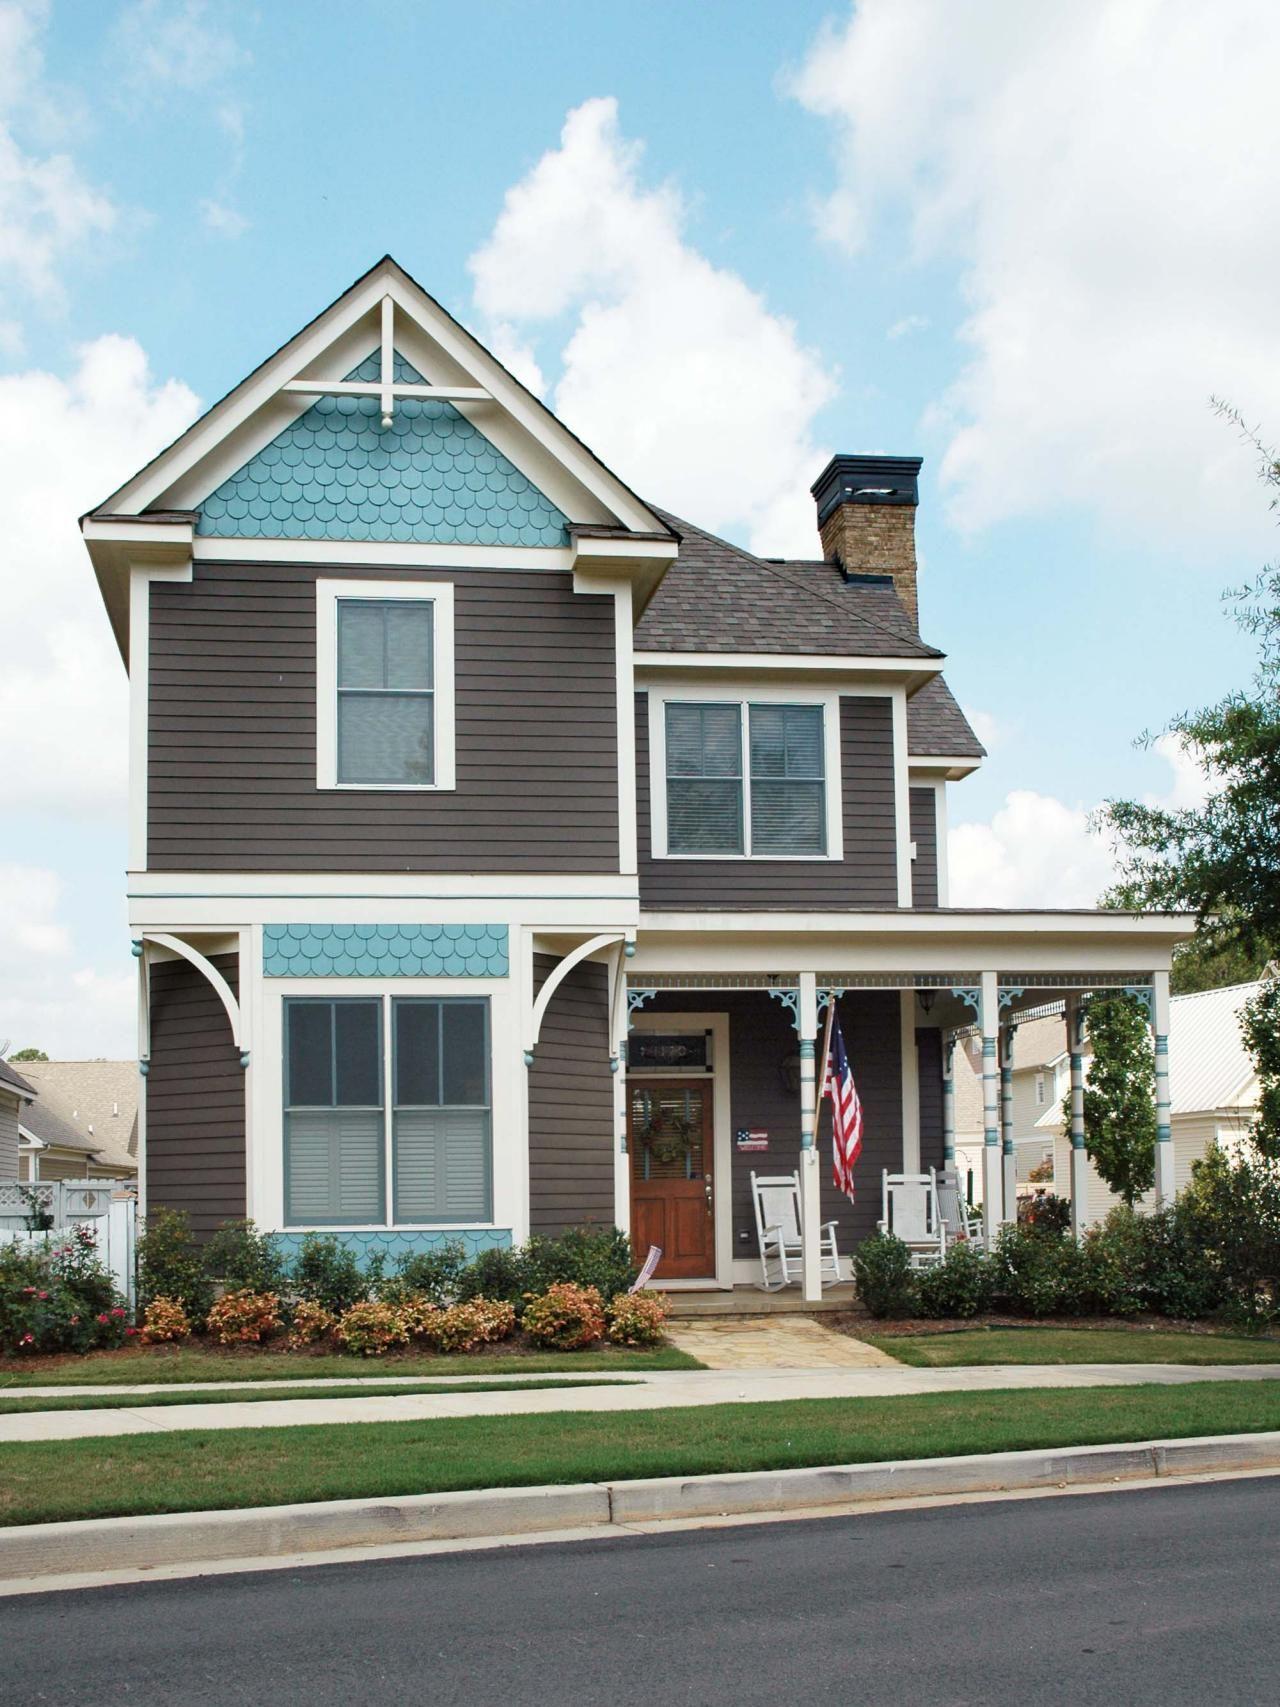 Home Exterior Design 5 Ideas 31 Pictures: Exterior Siding, House Exterior, House Designs